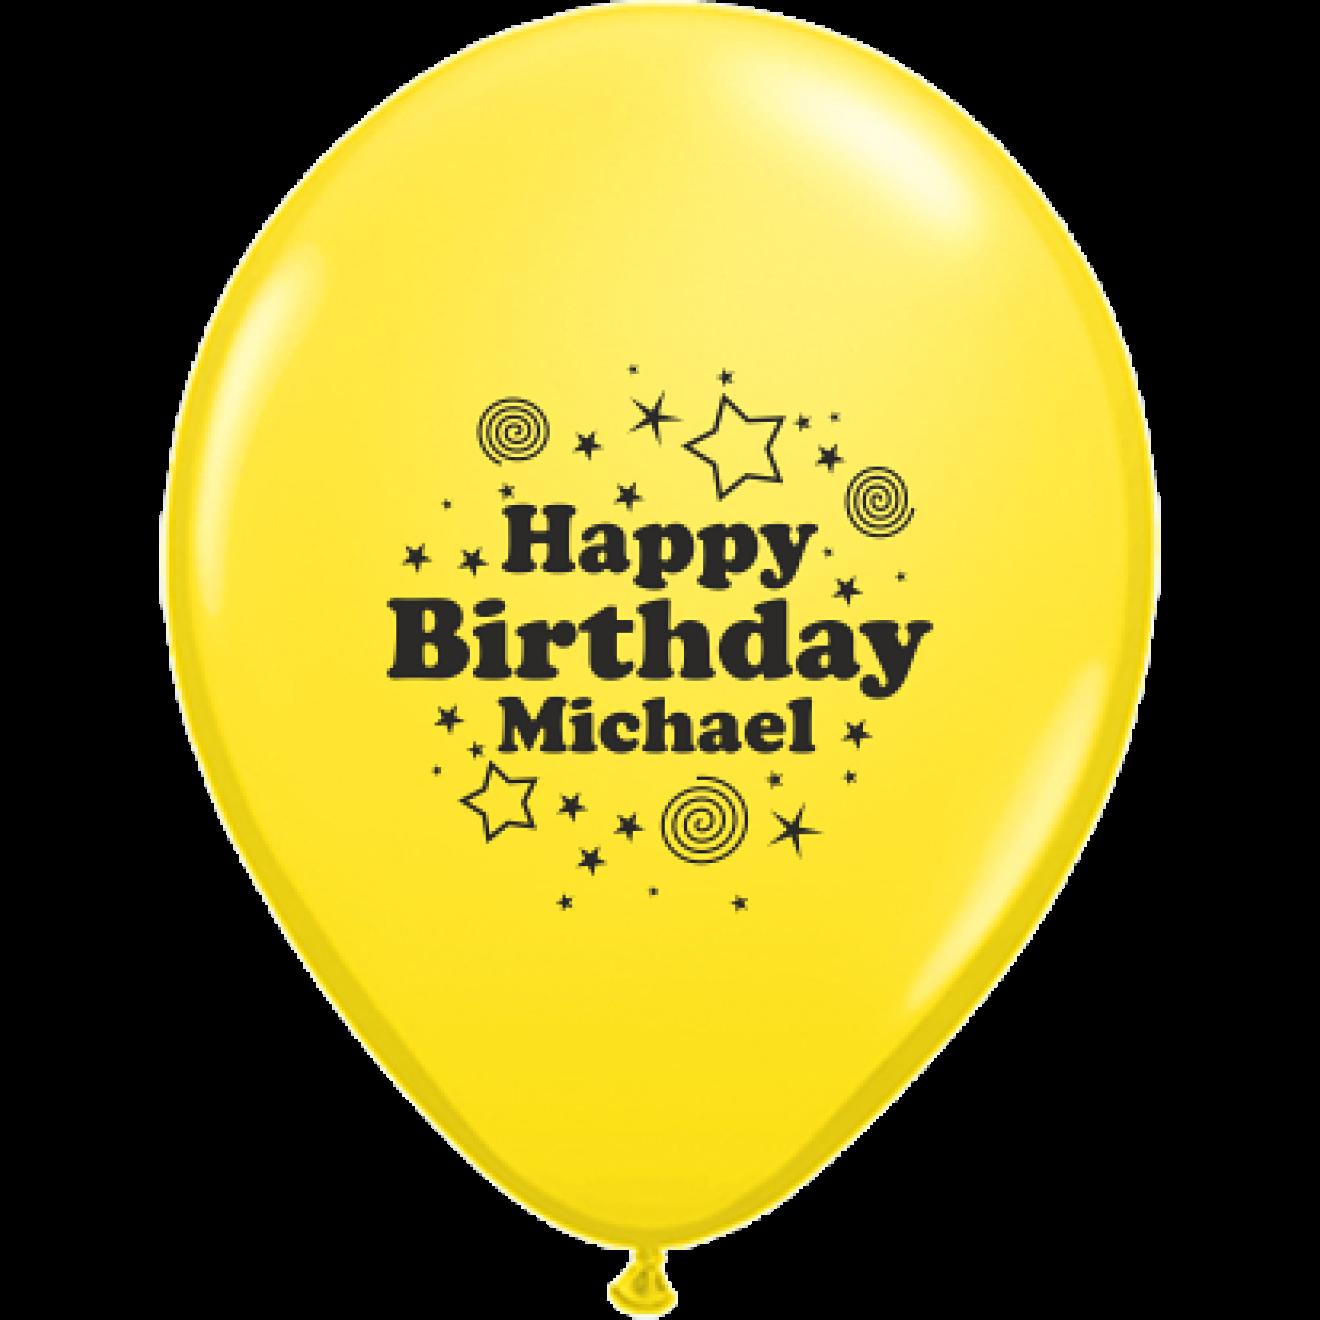 luftballons bedrucken geburtstag happy birthday name 30 cm ballondruck. Black Bedroom Furniture Sets. Home Design Ideas